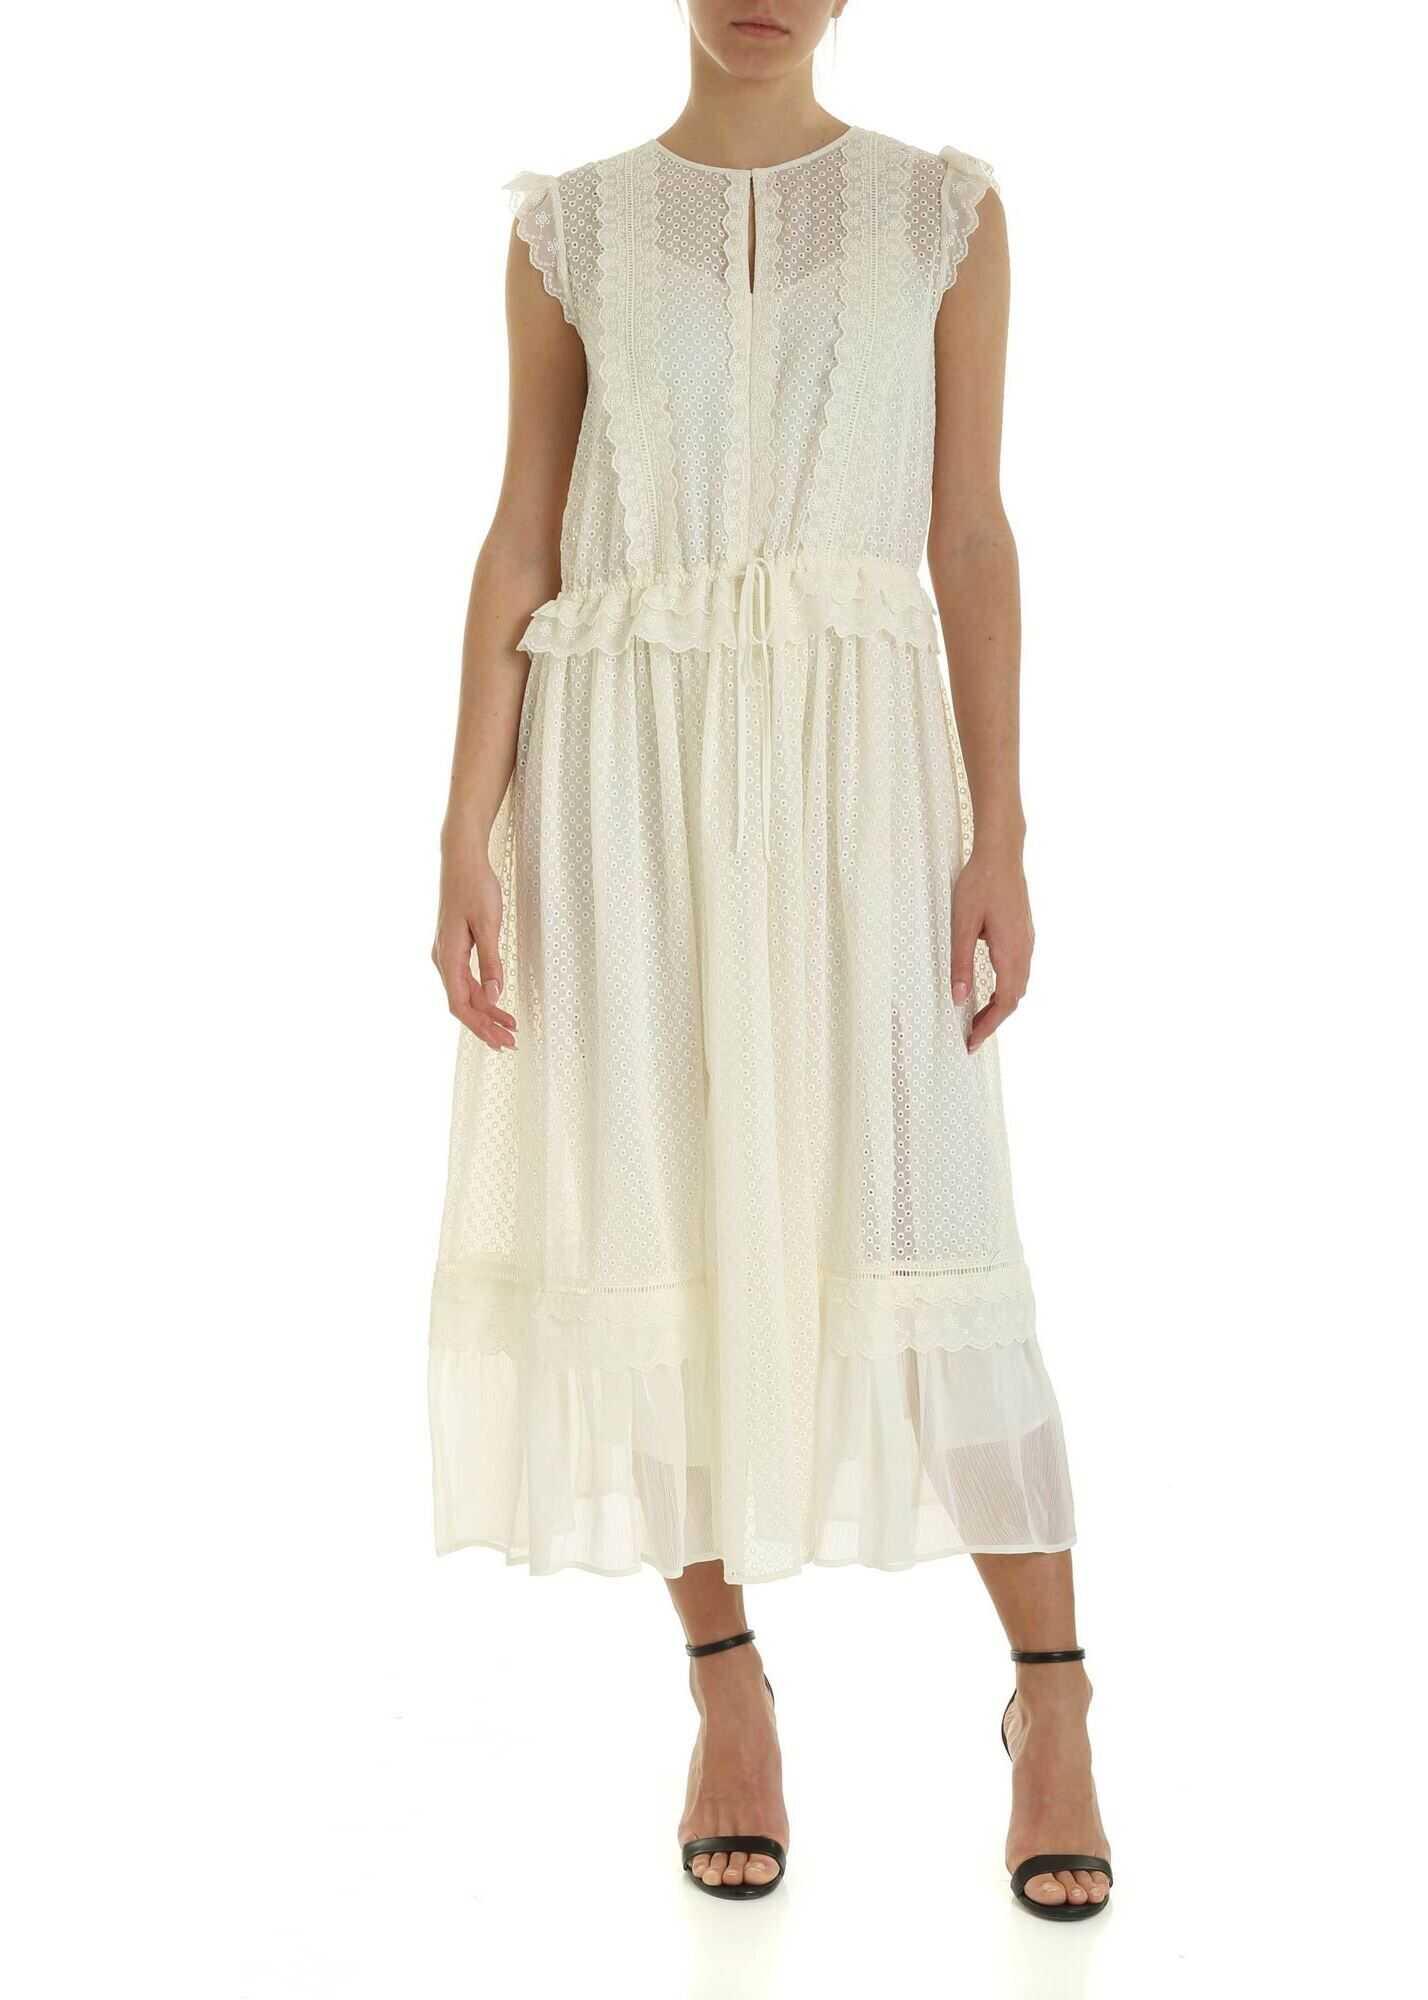 Twin-set Simona Barbieri Tone-On-Tone Embroidery Dress In Cream Color Cream